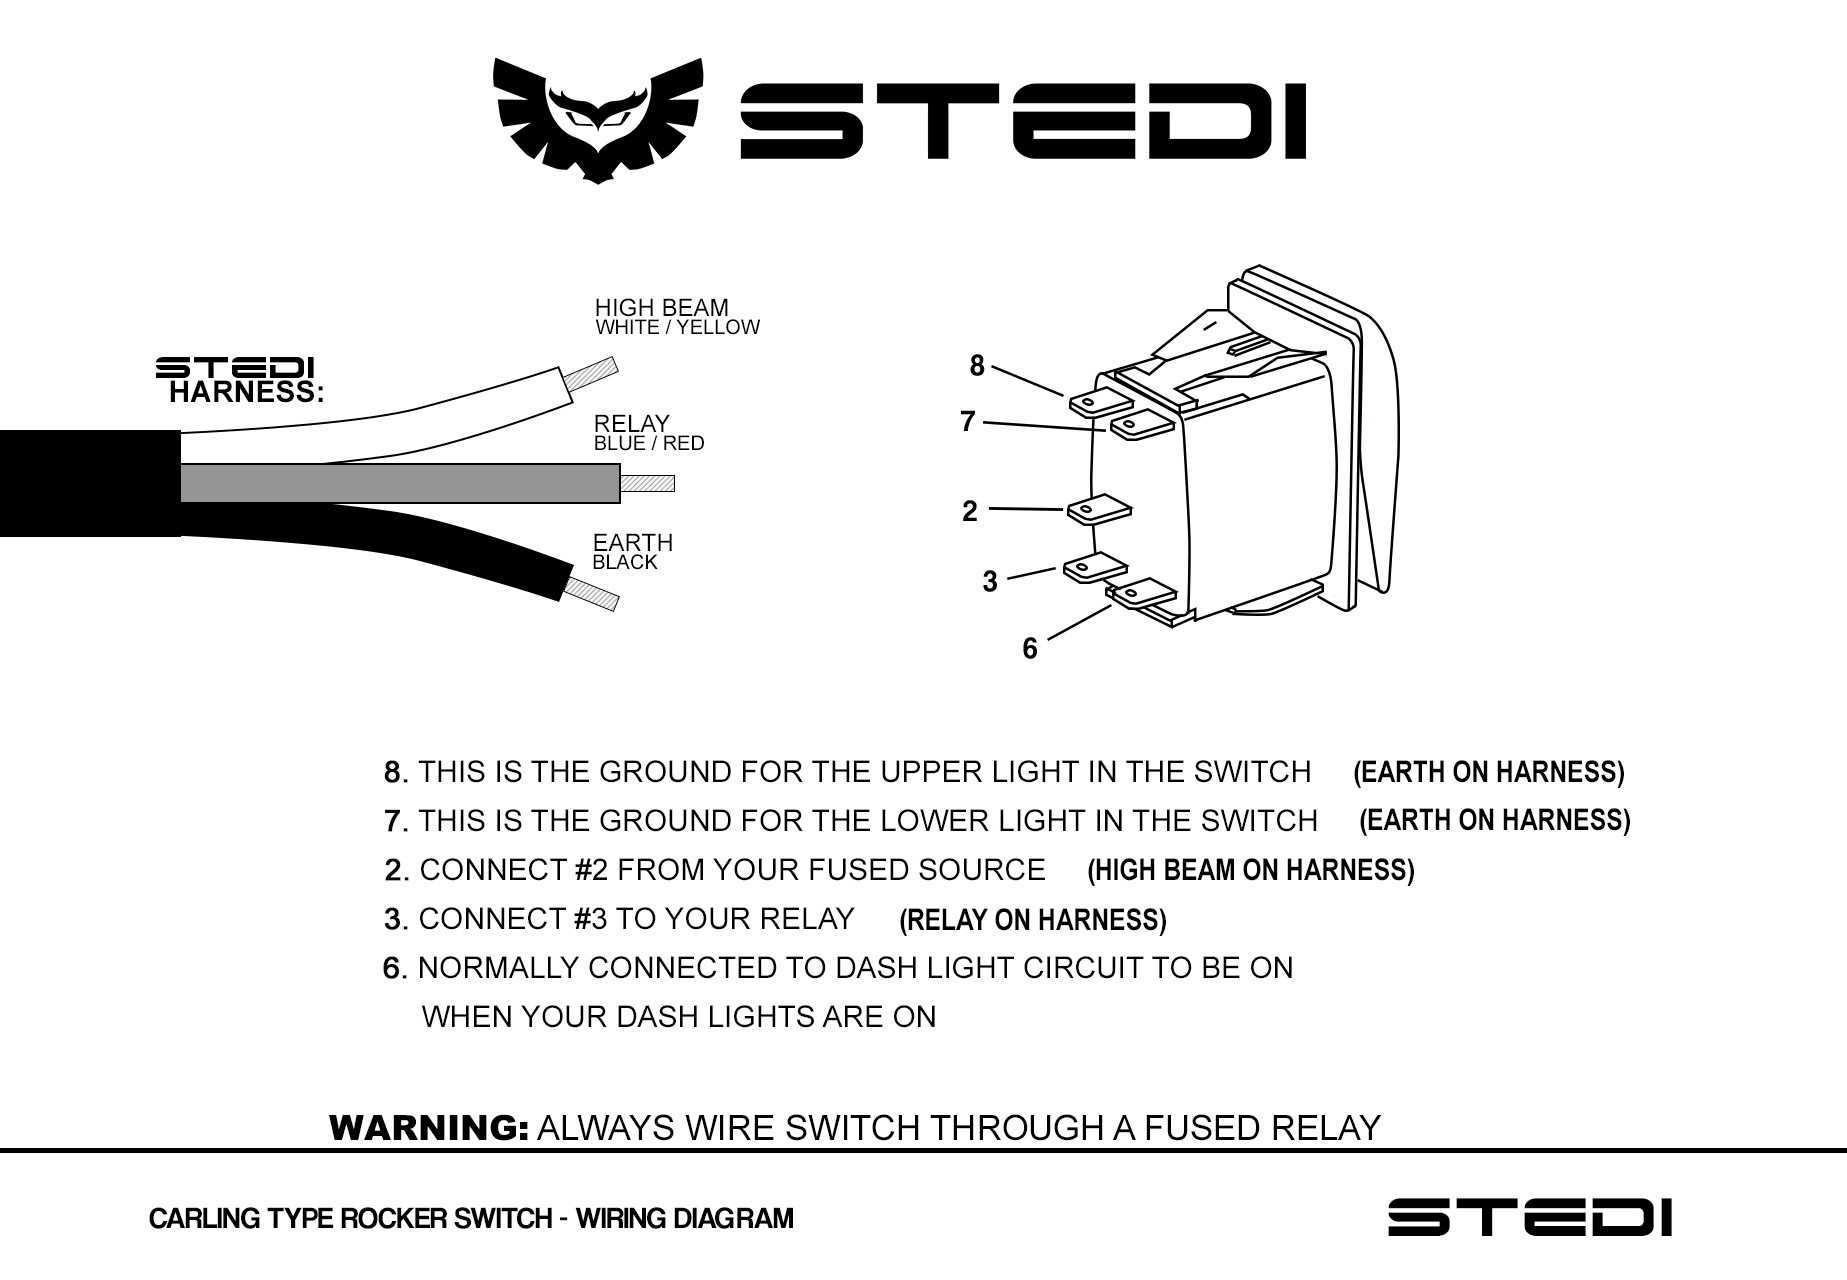 Arb Headlight Wiring Loom Diagram | Wiring Diagram on